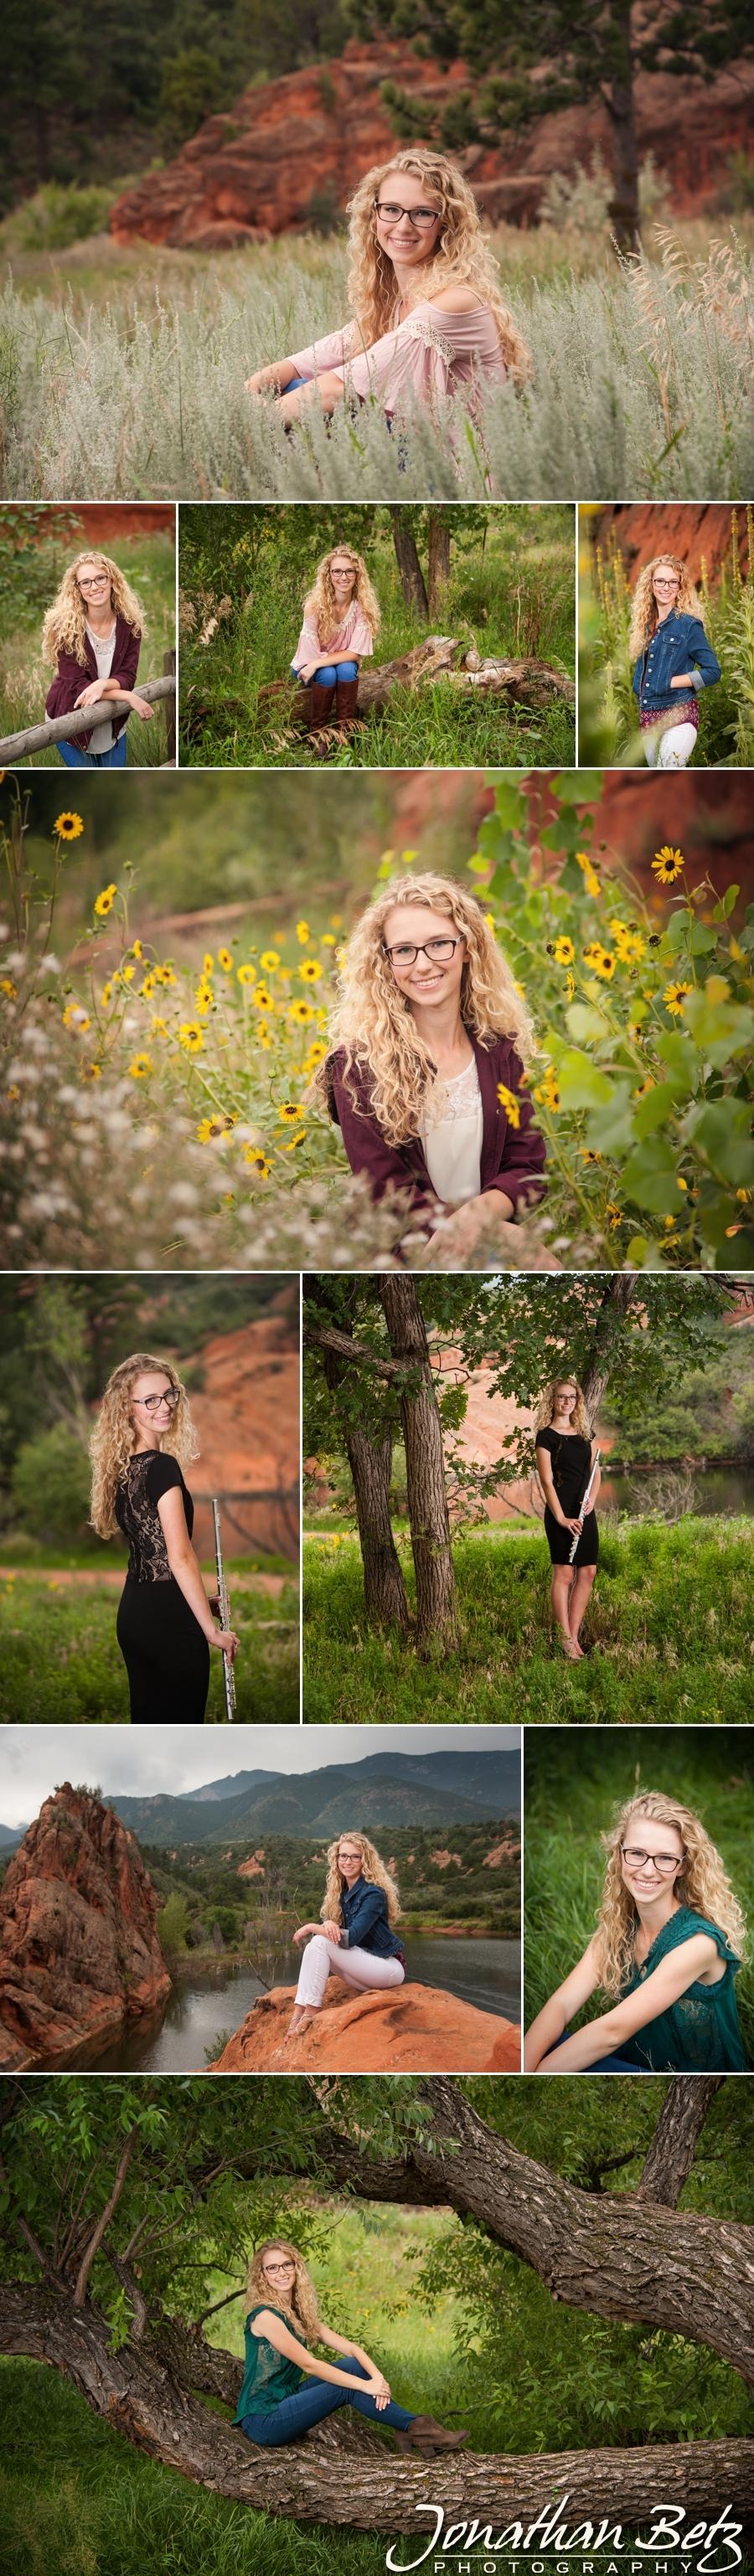 Cheyenne Mountain High School senior portraits Jonathan Betz Photography Colorado Springs Photographer 1